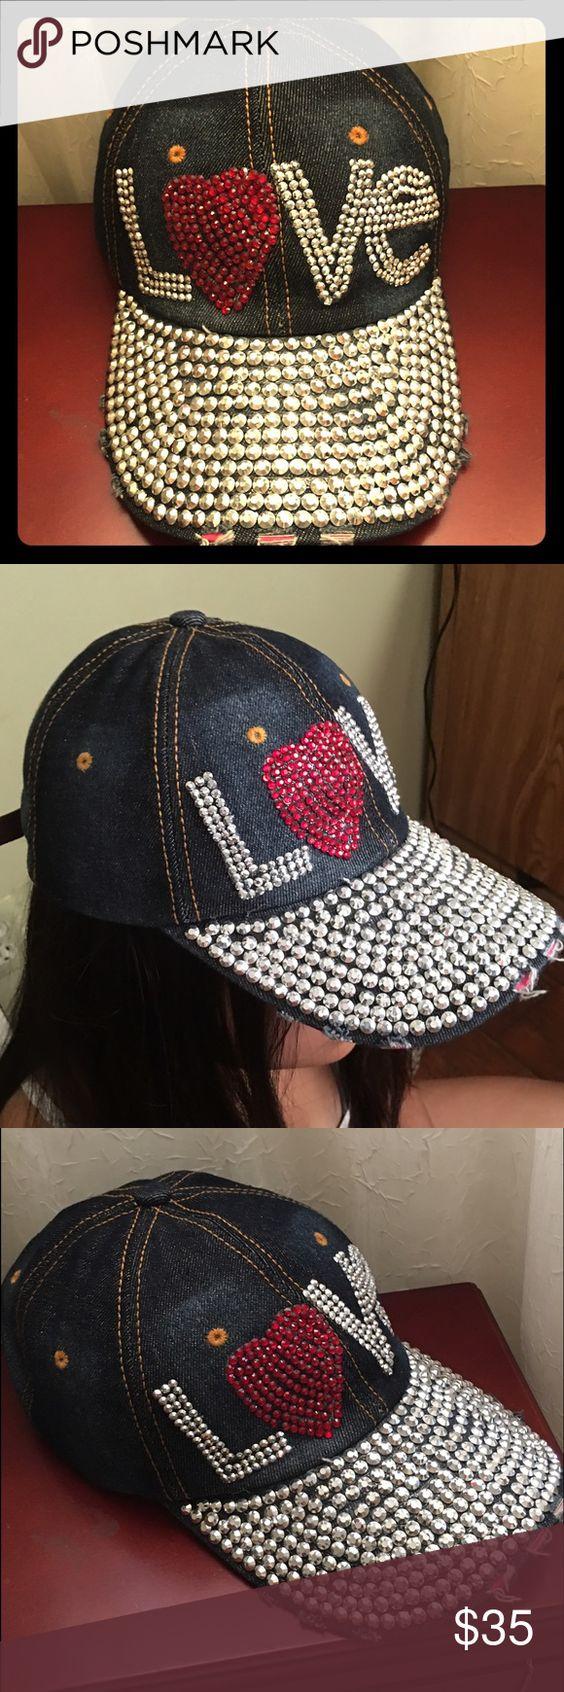 L❤️VE Rhinestones Denim Baseball Cap Beaituful Denim Rhinestones Baseball cap, adjustable size. NEW. Accessories Hats